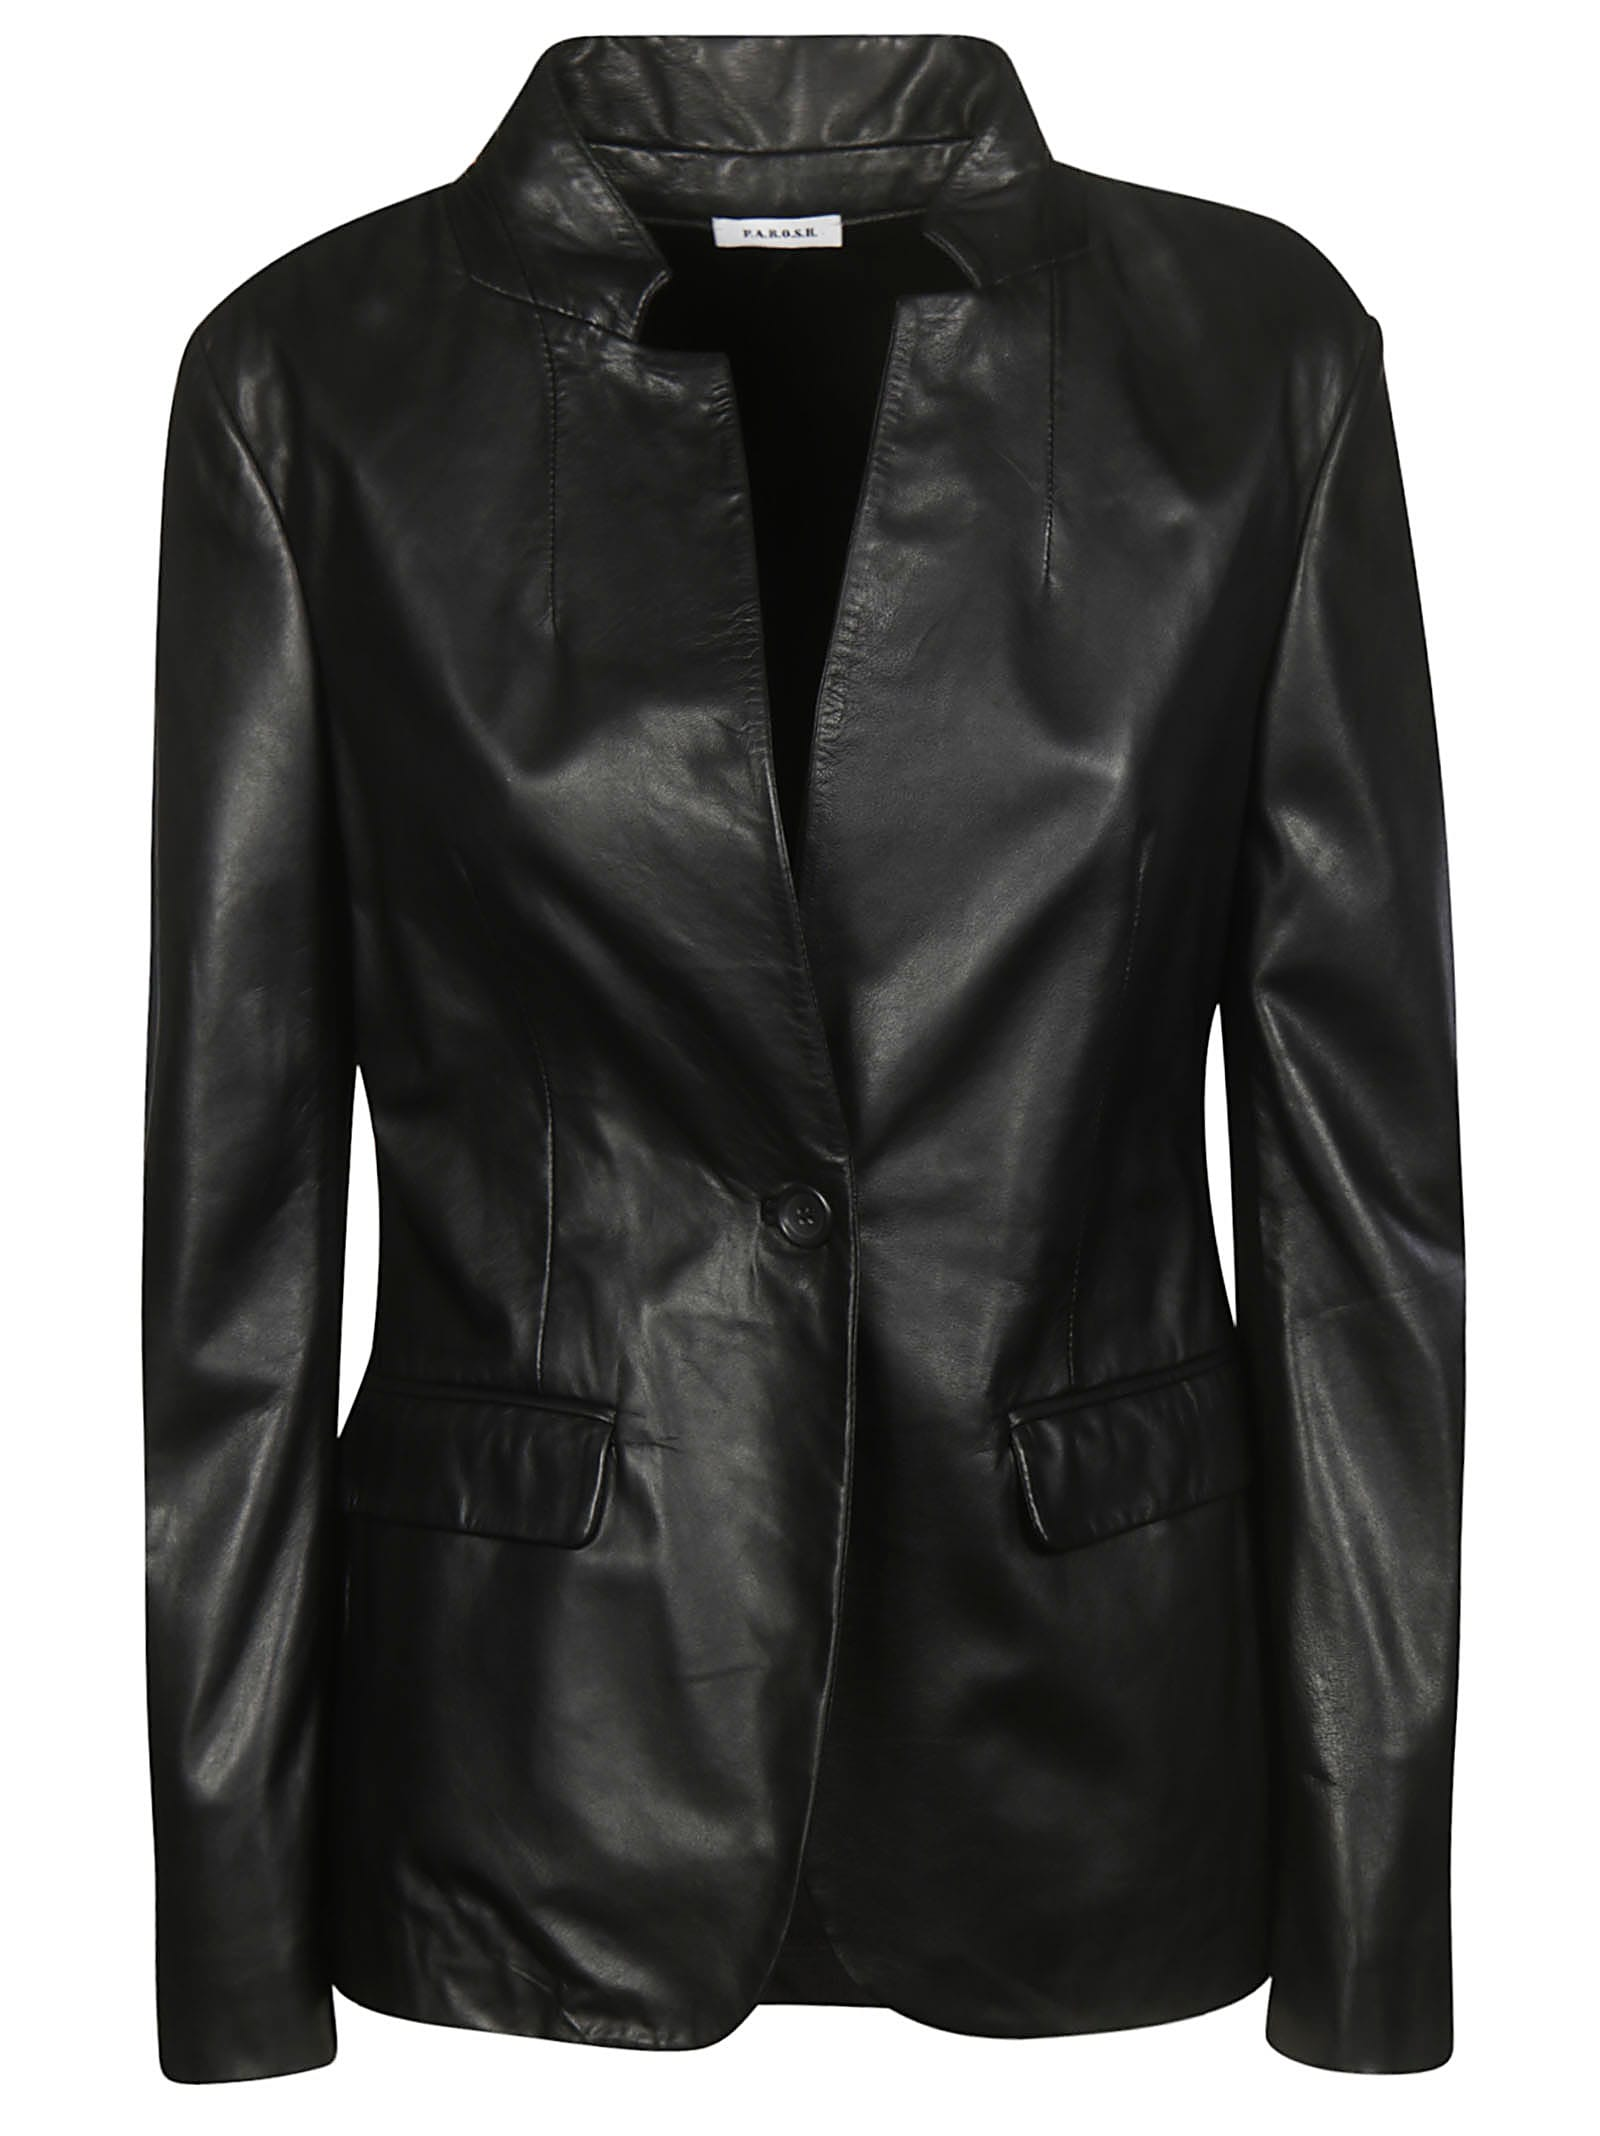 Parosh Maze Jacket